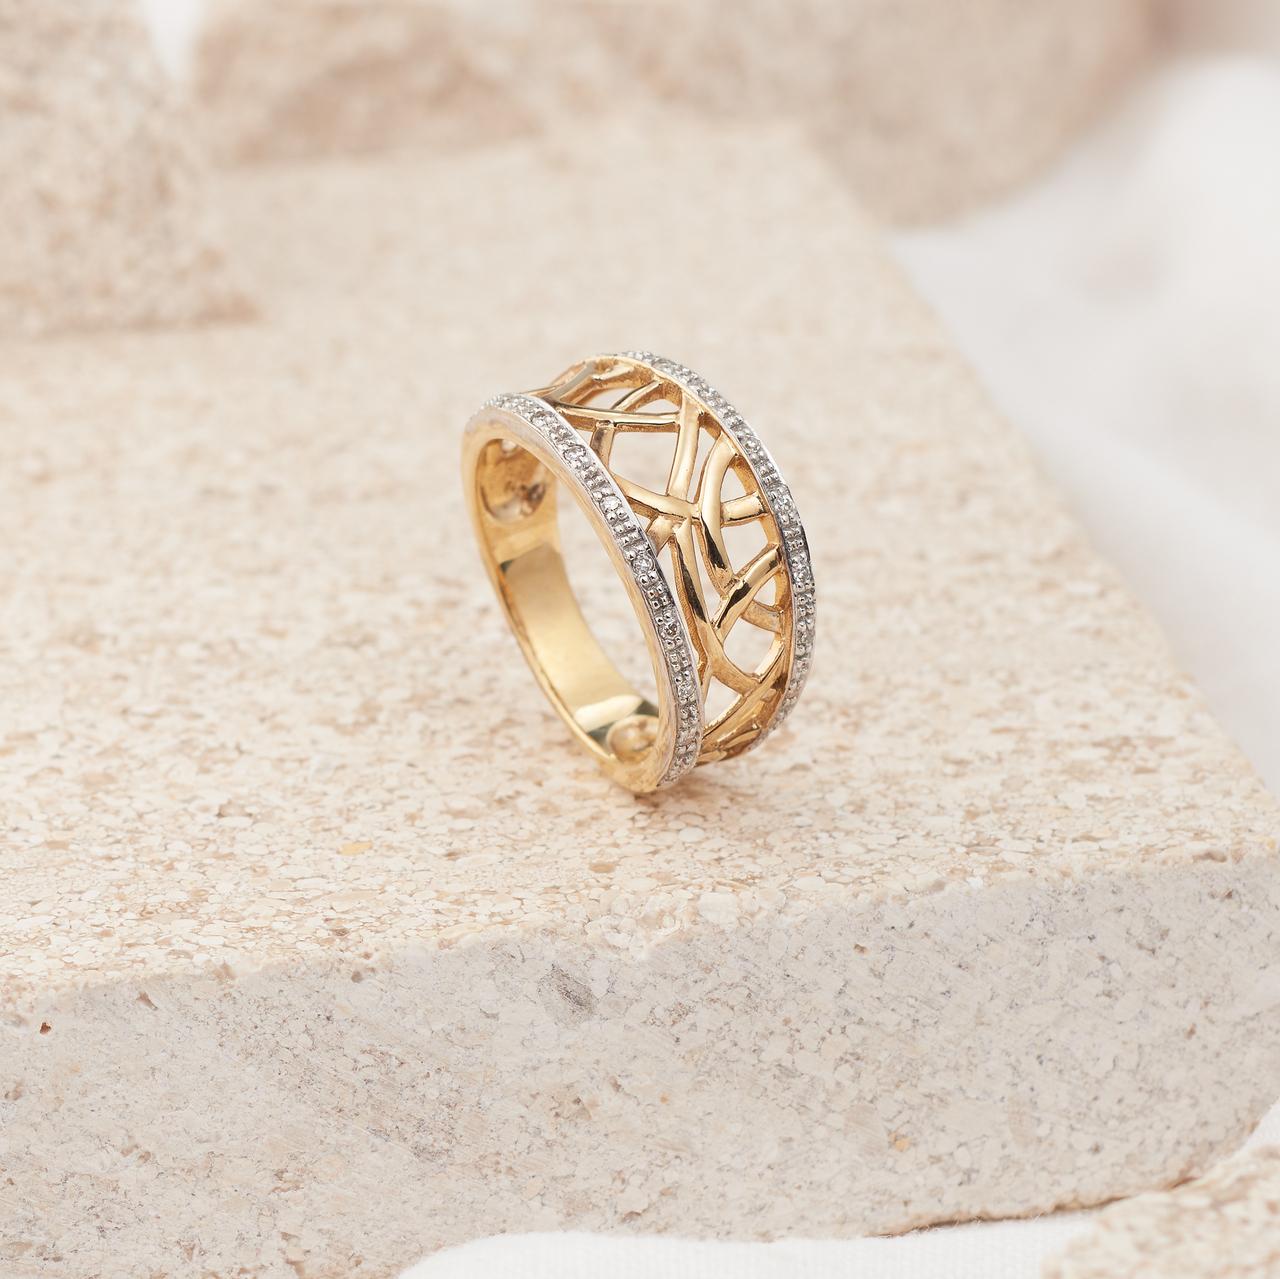 9K Yellow Gold Diamond Abstract Tangle Dress Ring 0.1tdw